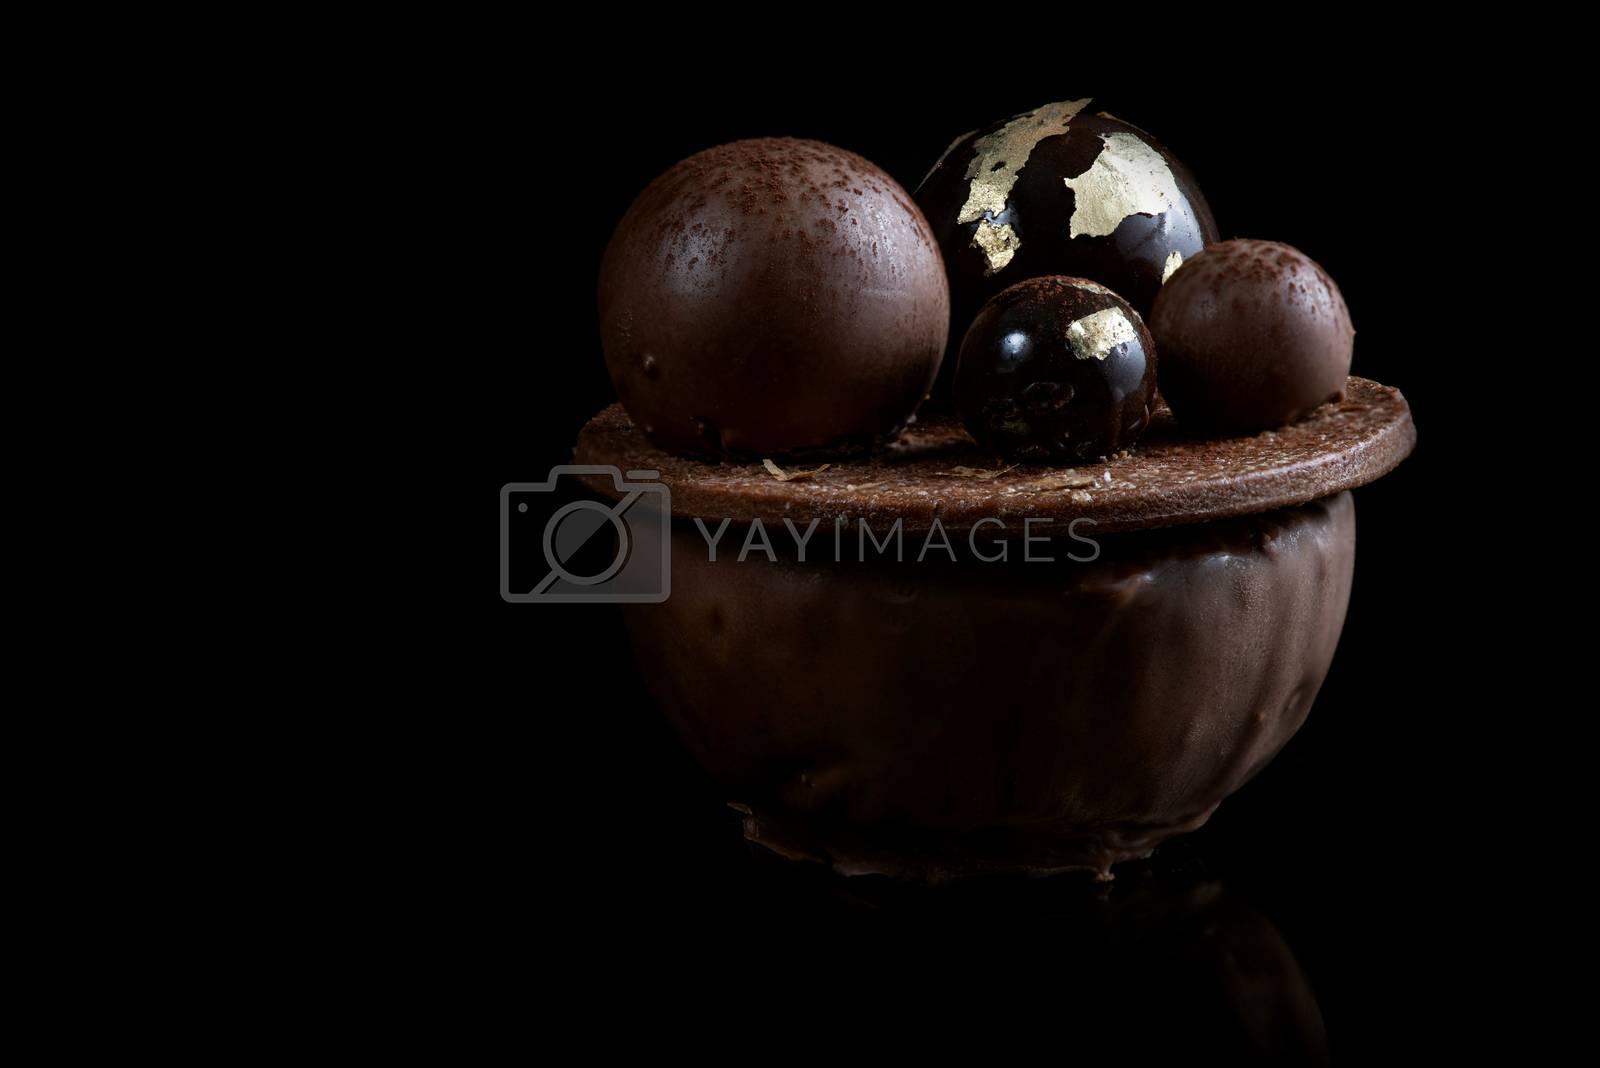 Artisan Monoportion Cake. Handmade Chocolate Dessert. Black Back by merc67